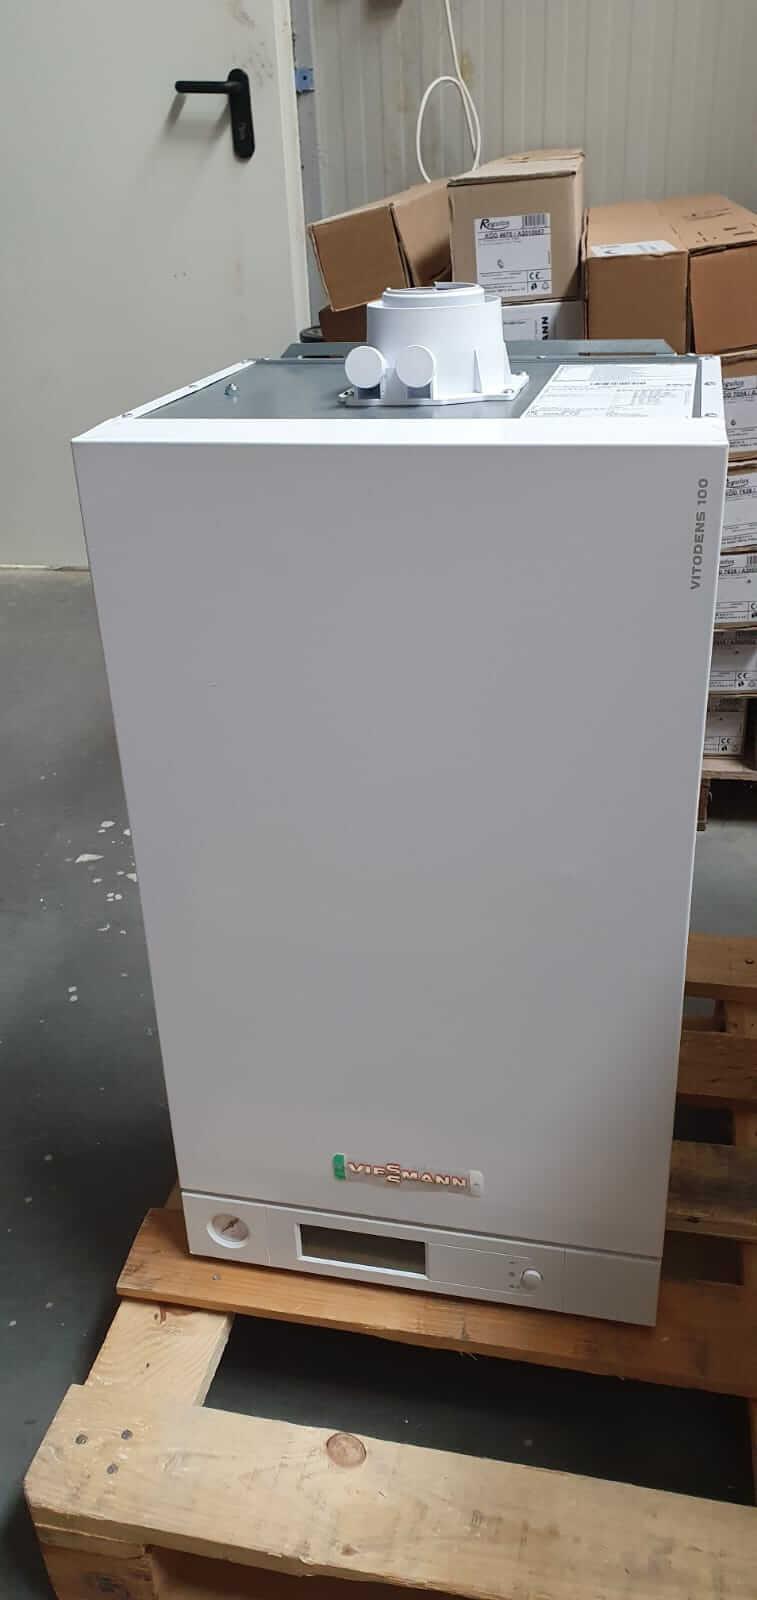 Poza Centrala termica in condensare cu touchscreen Viessmann Vitodens 100-W 35 kw combi B1KC157 resigilat. Poza 17010